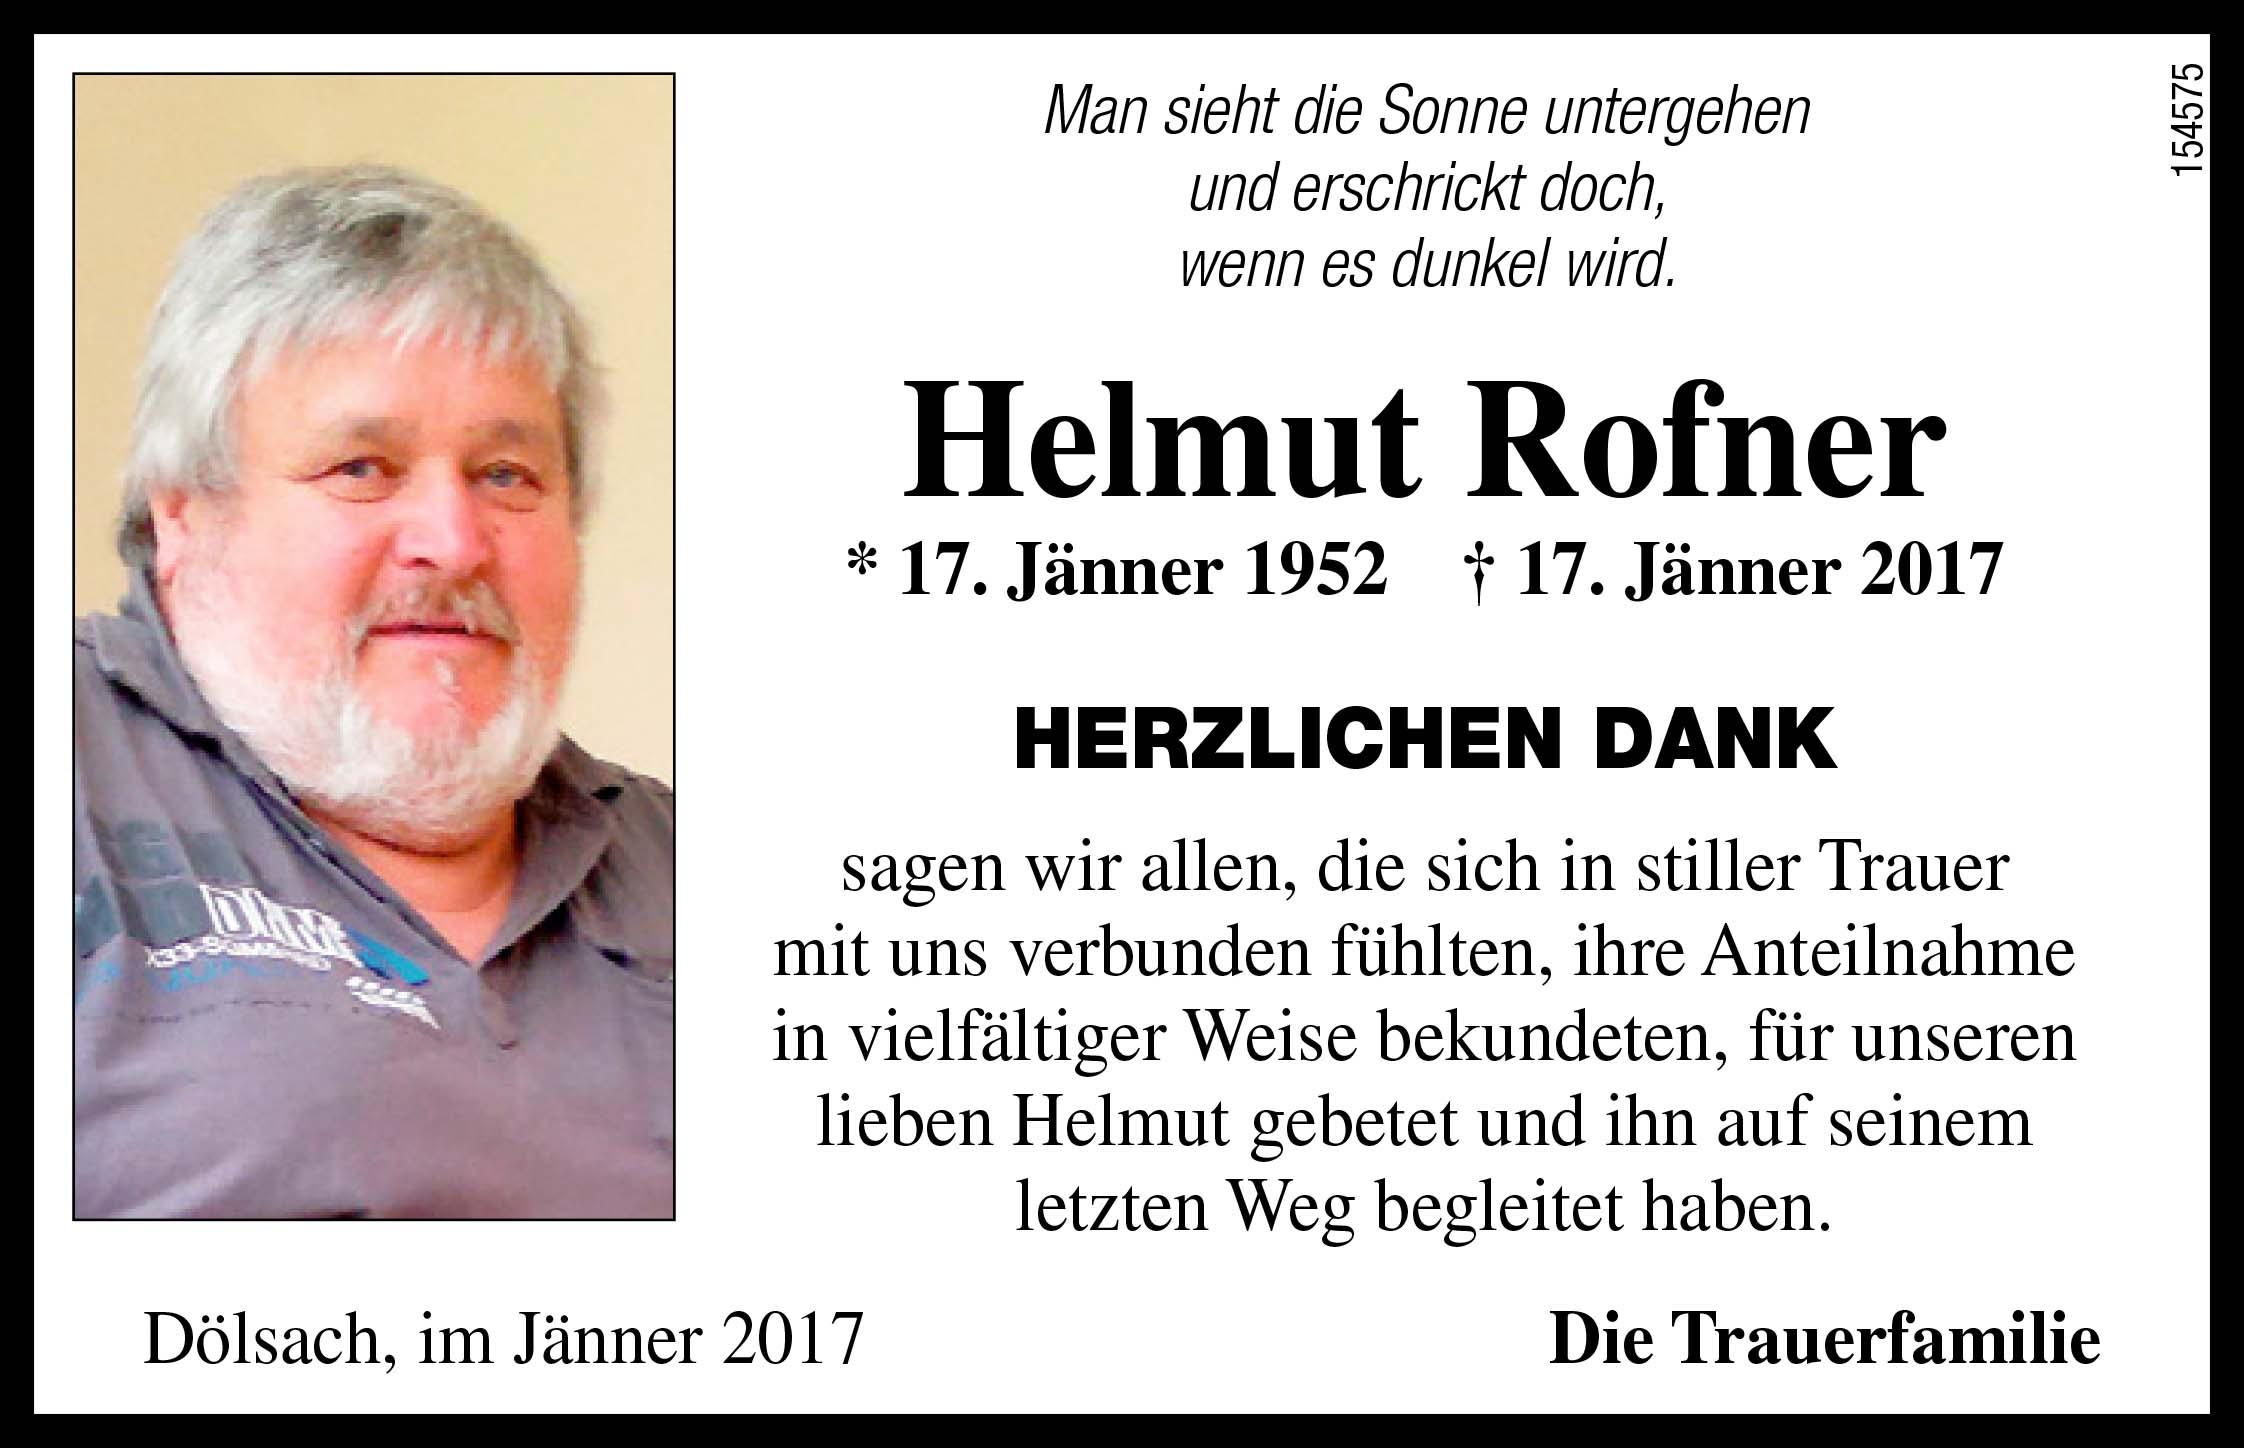 Hof bei Salzburg: Wolfgangsee Strae war nach Unfall gesperrt